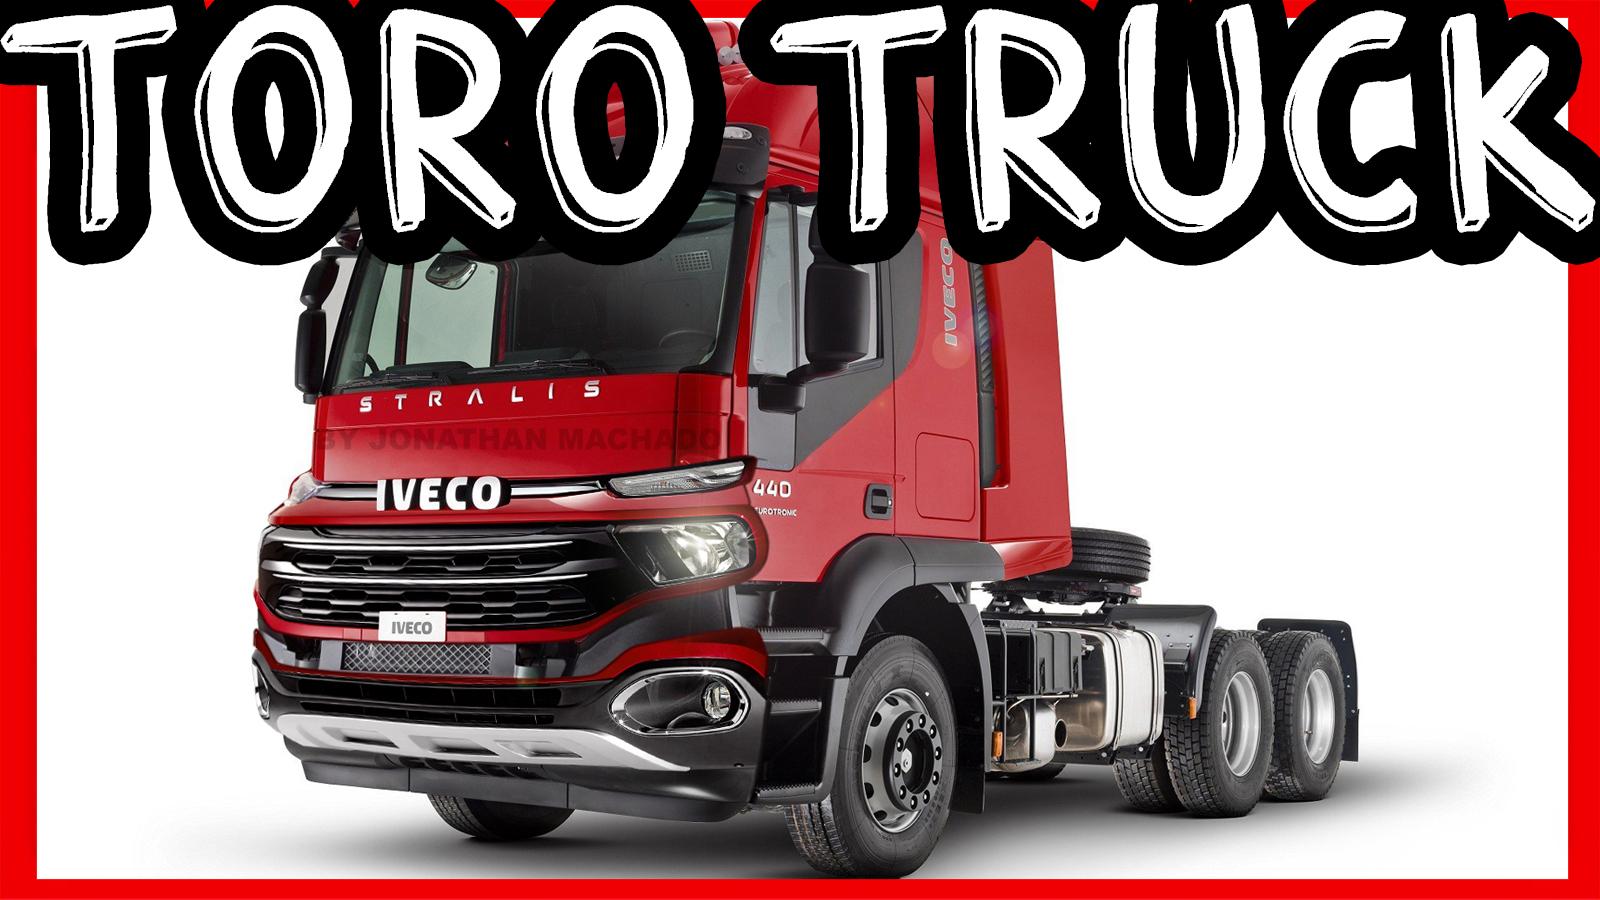 Photoshop Fiat Toro Truck 2020 Iveco Stralis Facelift 600s44t 6 2